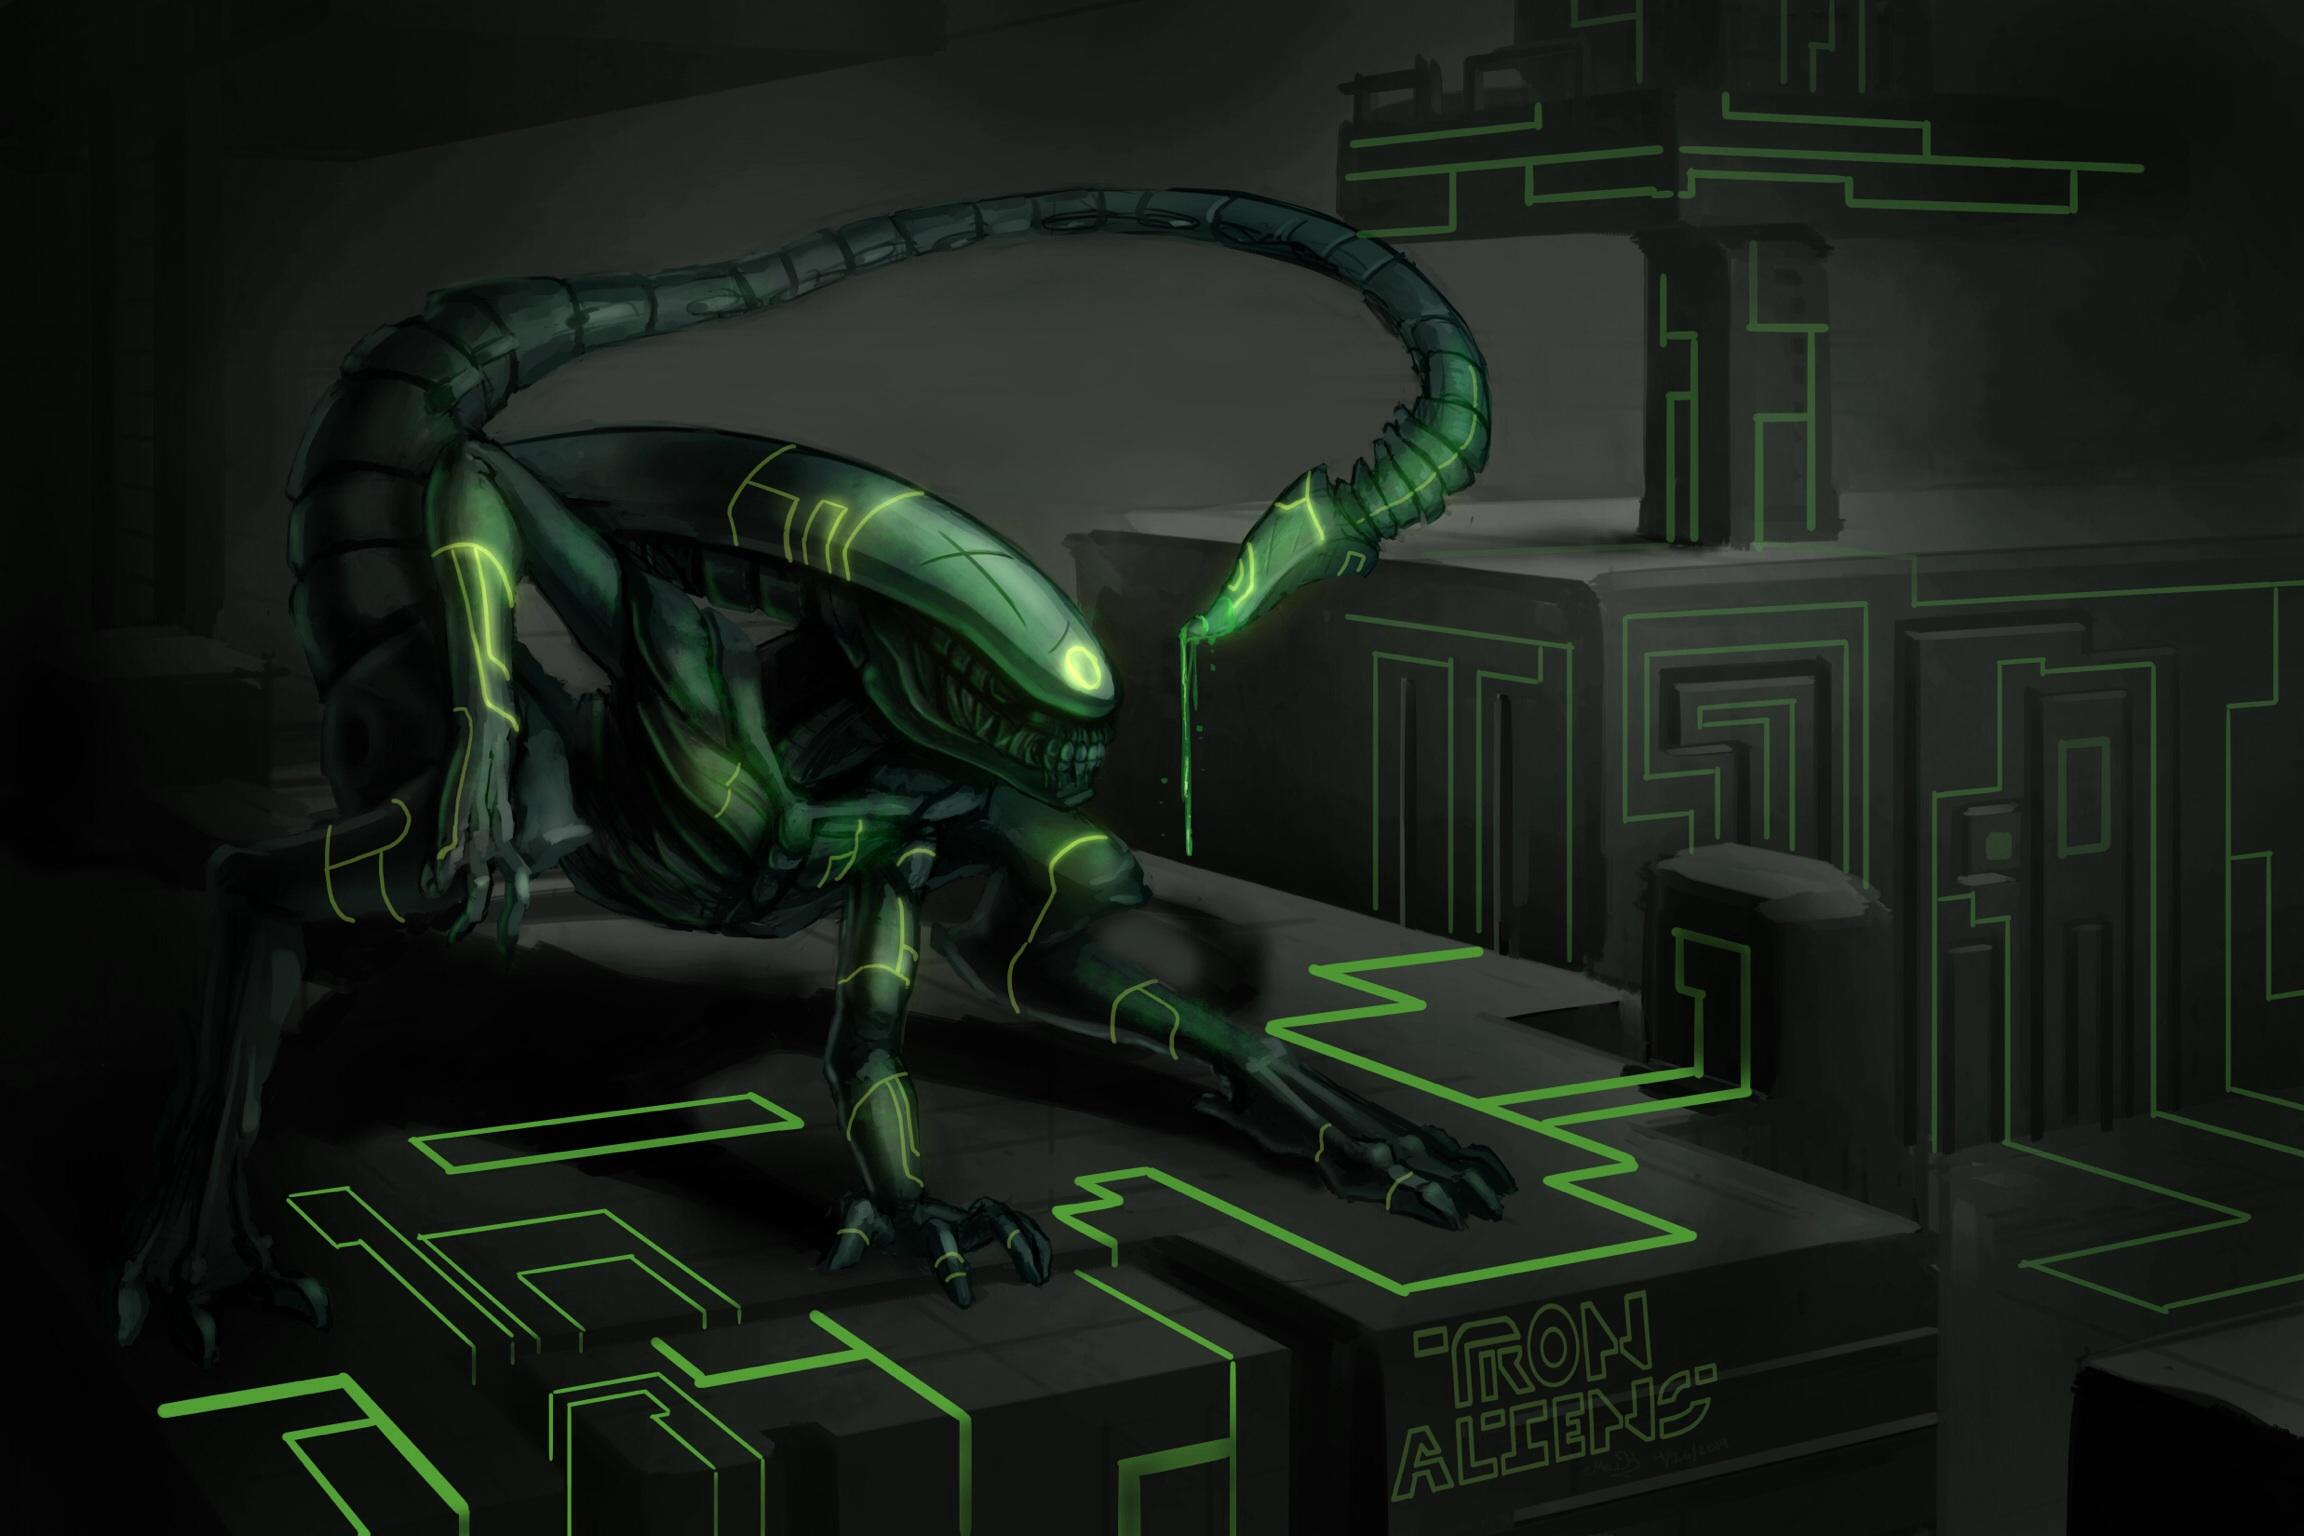 Tron Aliens